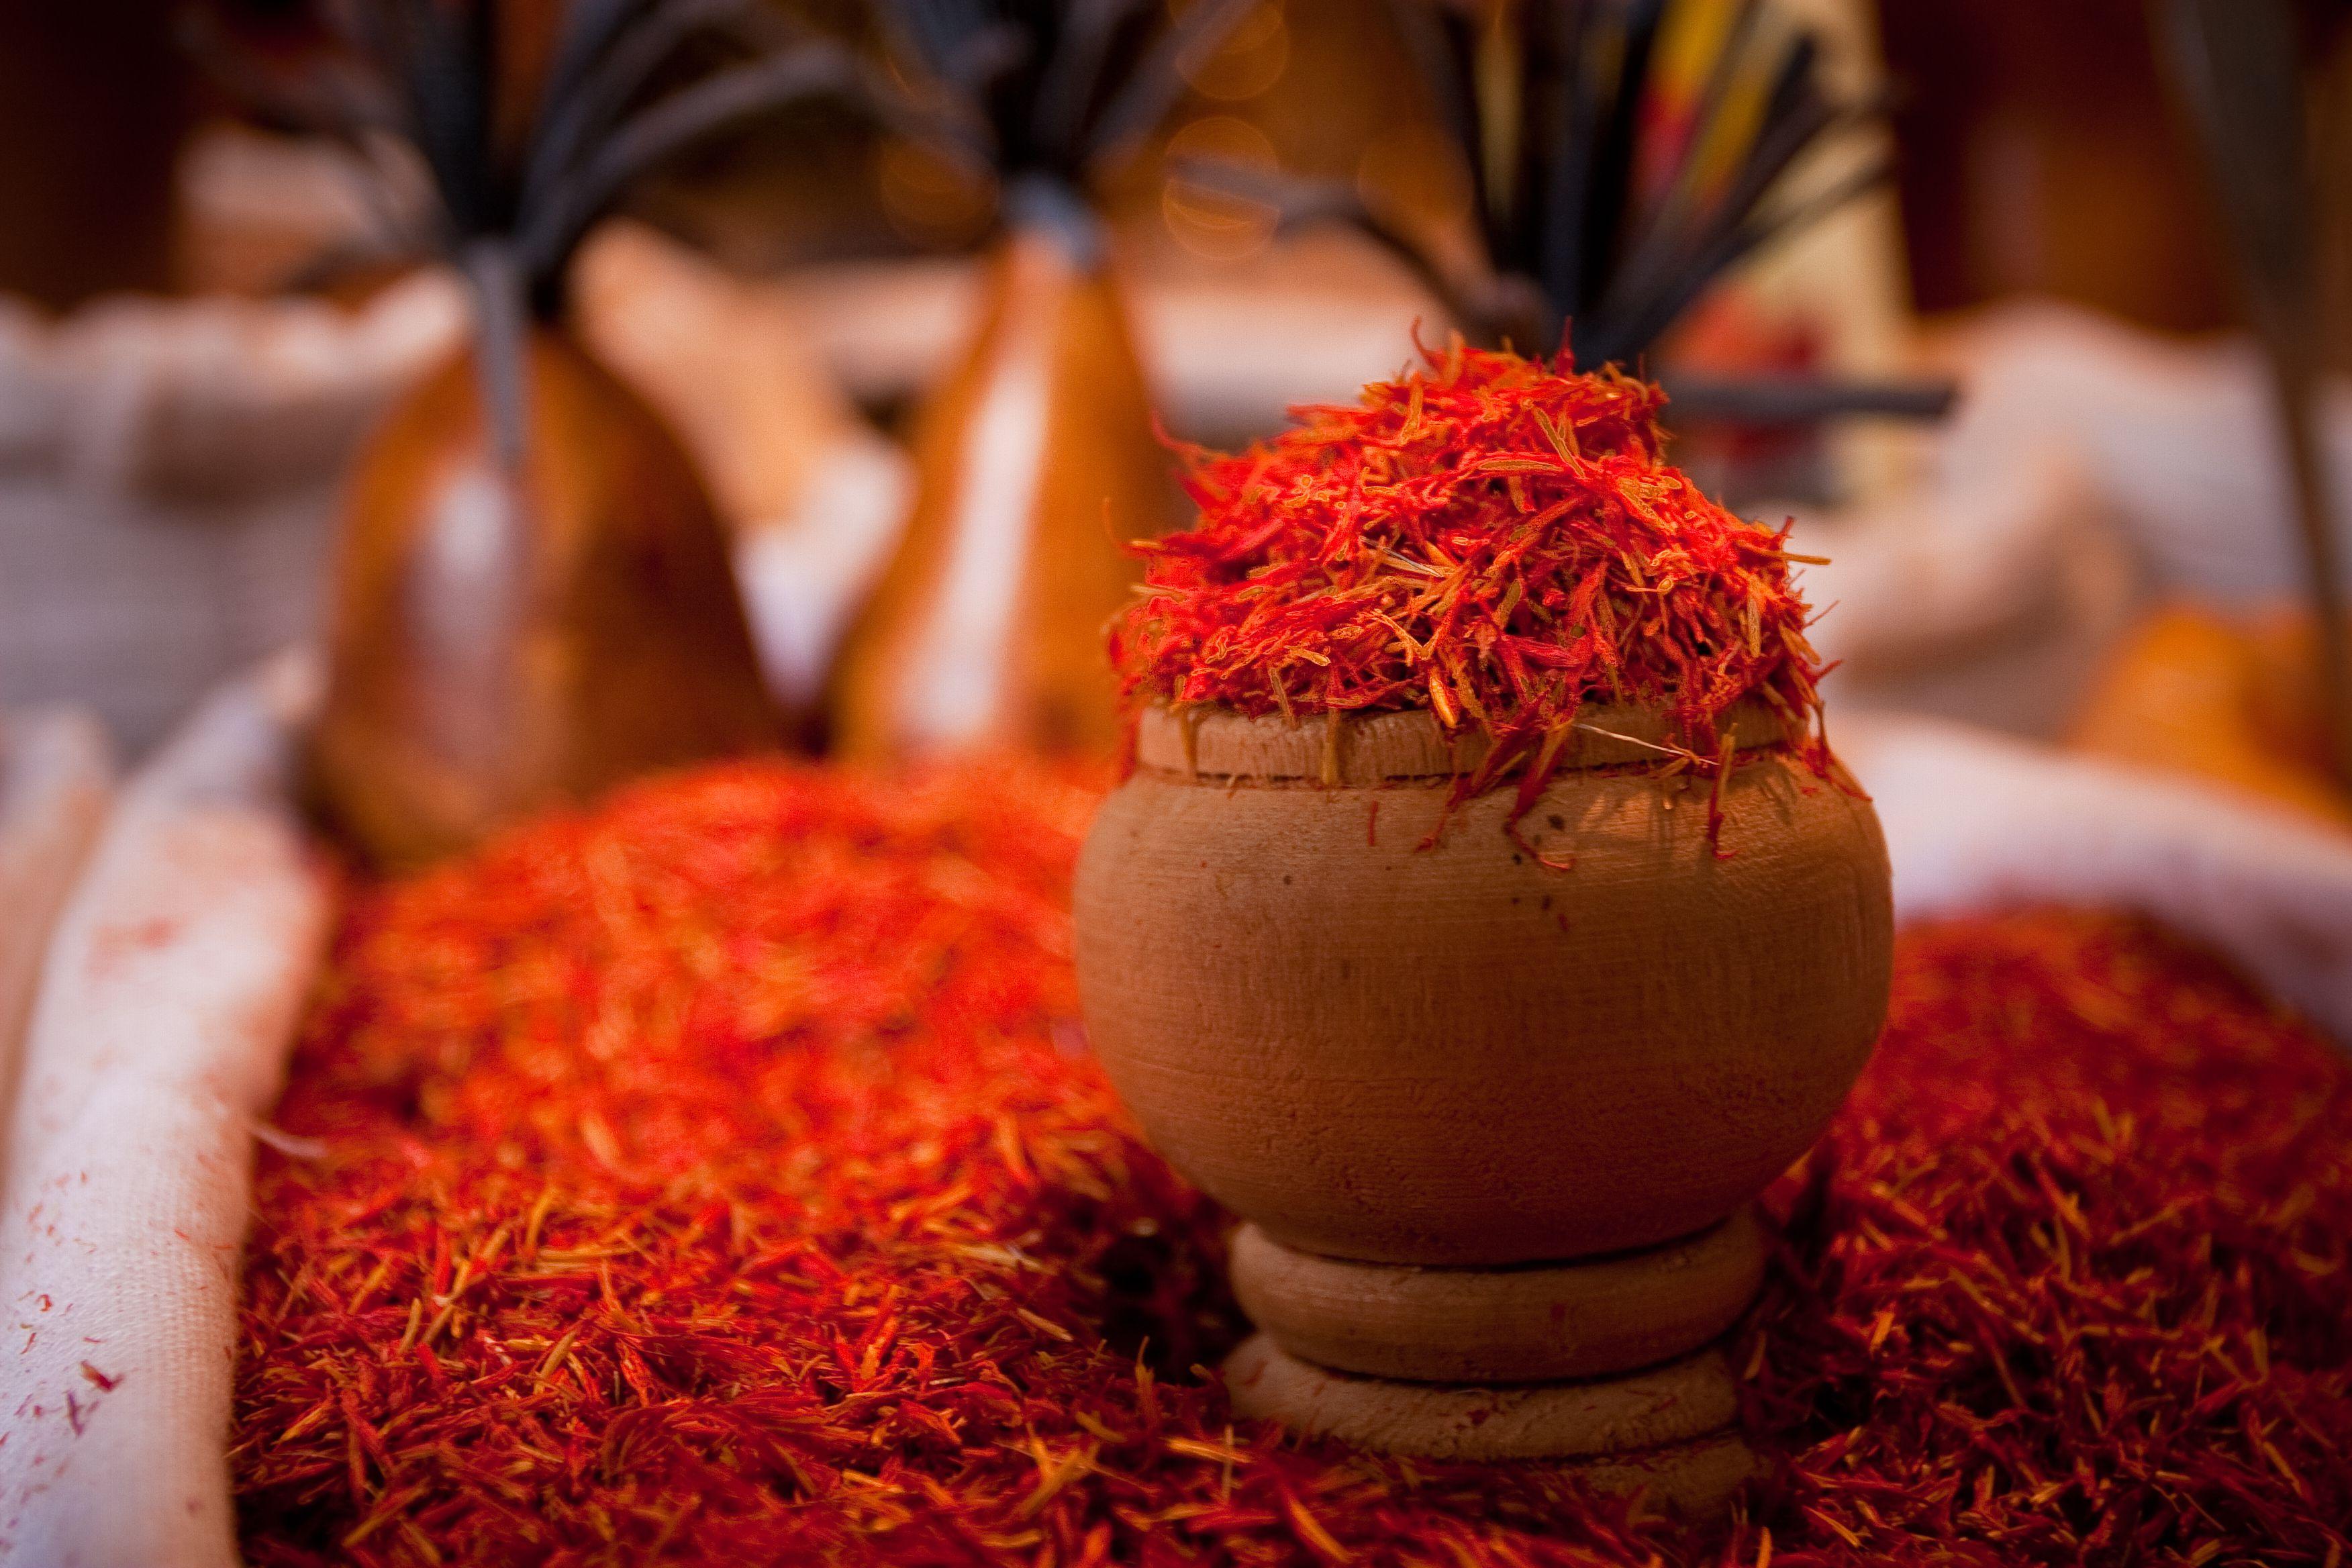 How To Use Spanish Saffron